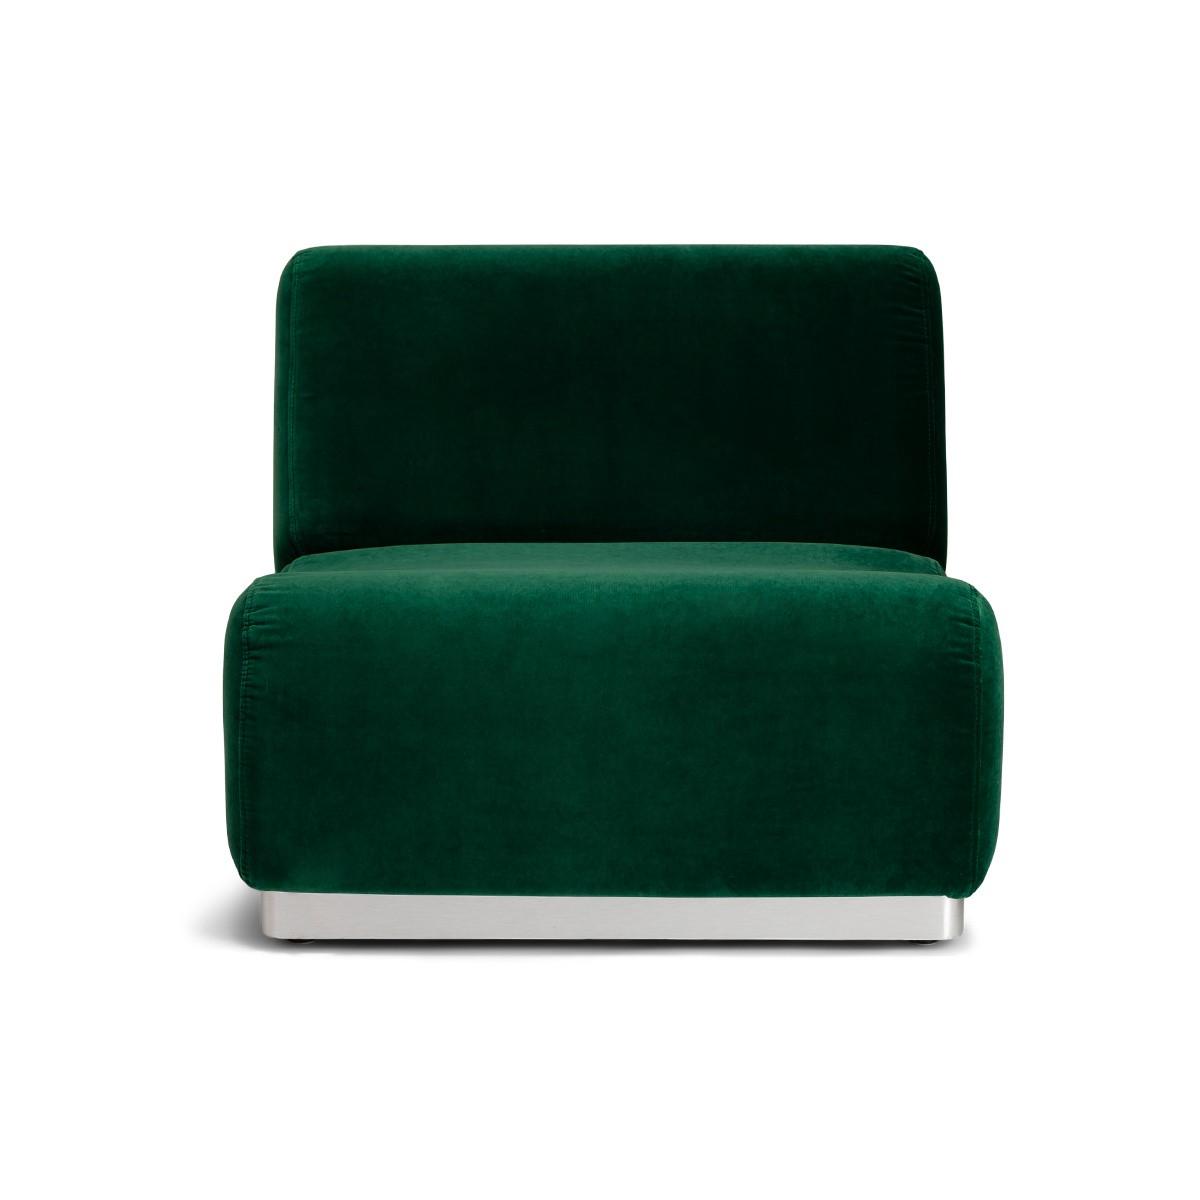 Chauffeuse modulable Rotondo velours vert sapin